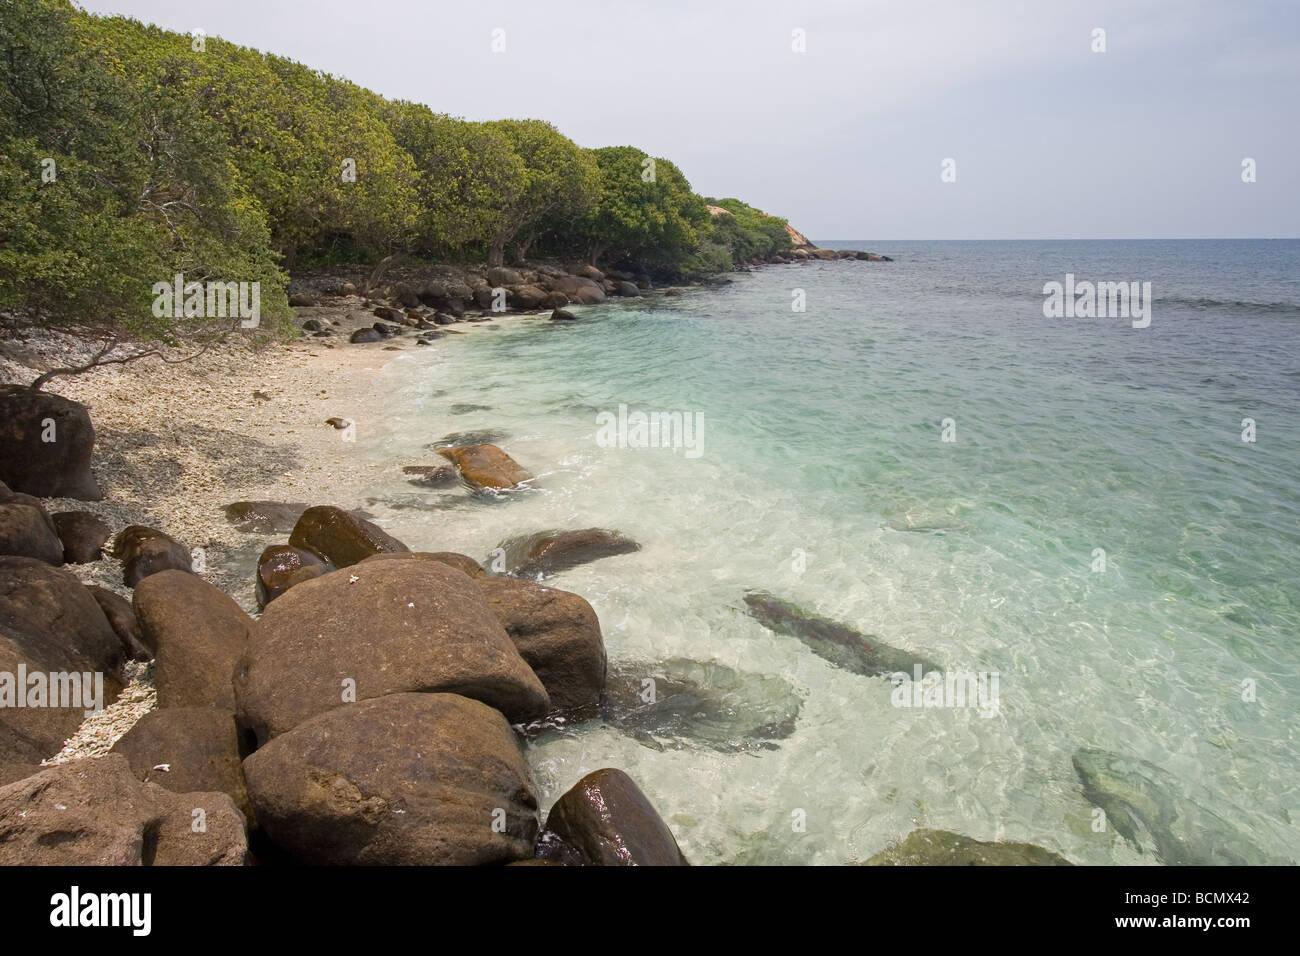 Pigeon Island Nilaveli Beach Trincomalee Sri Lanka Eine